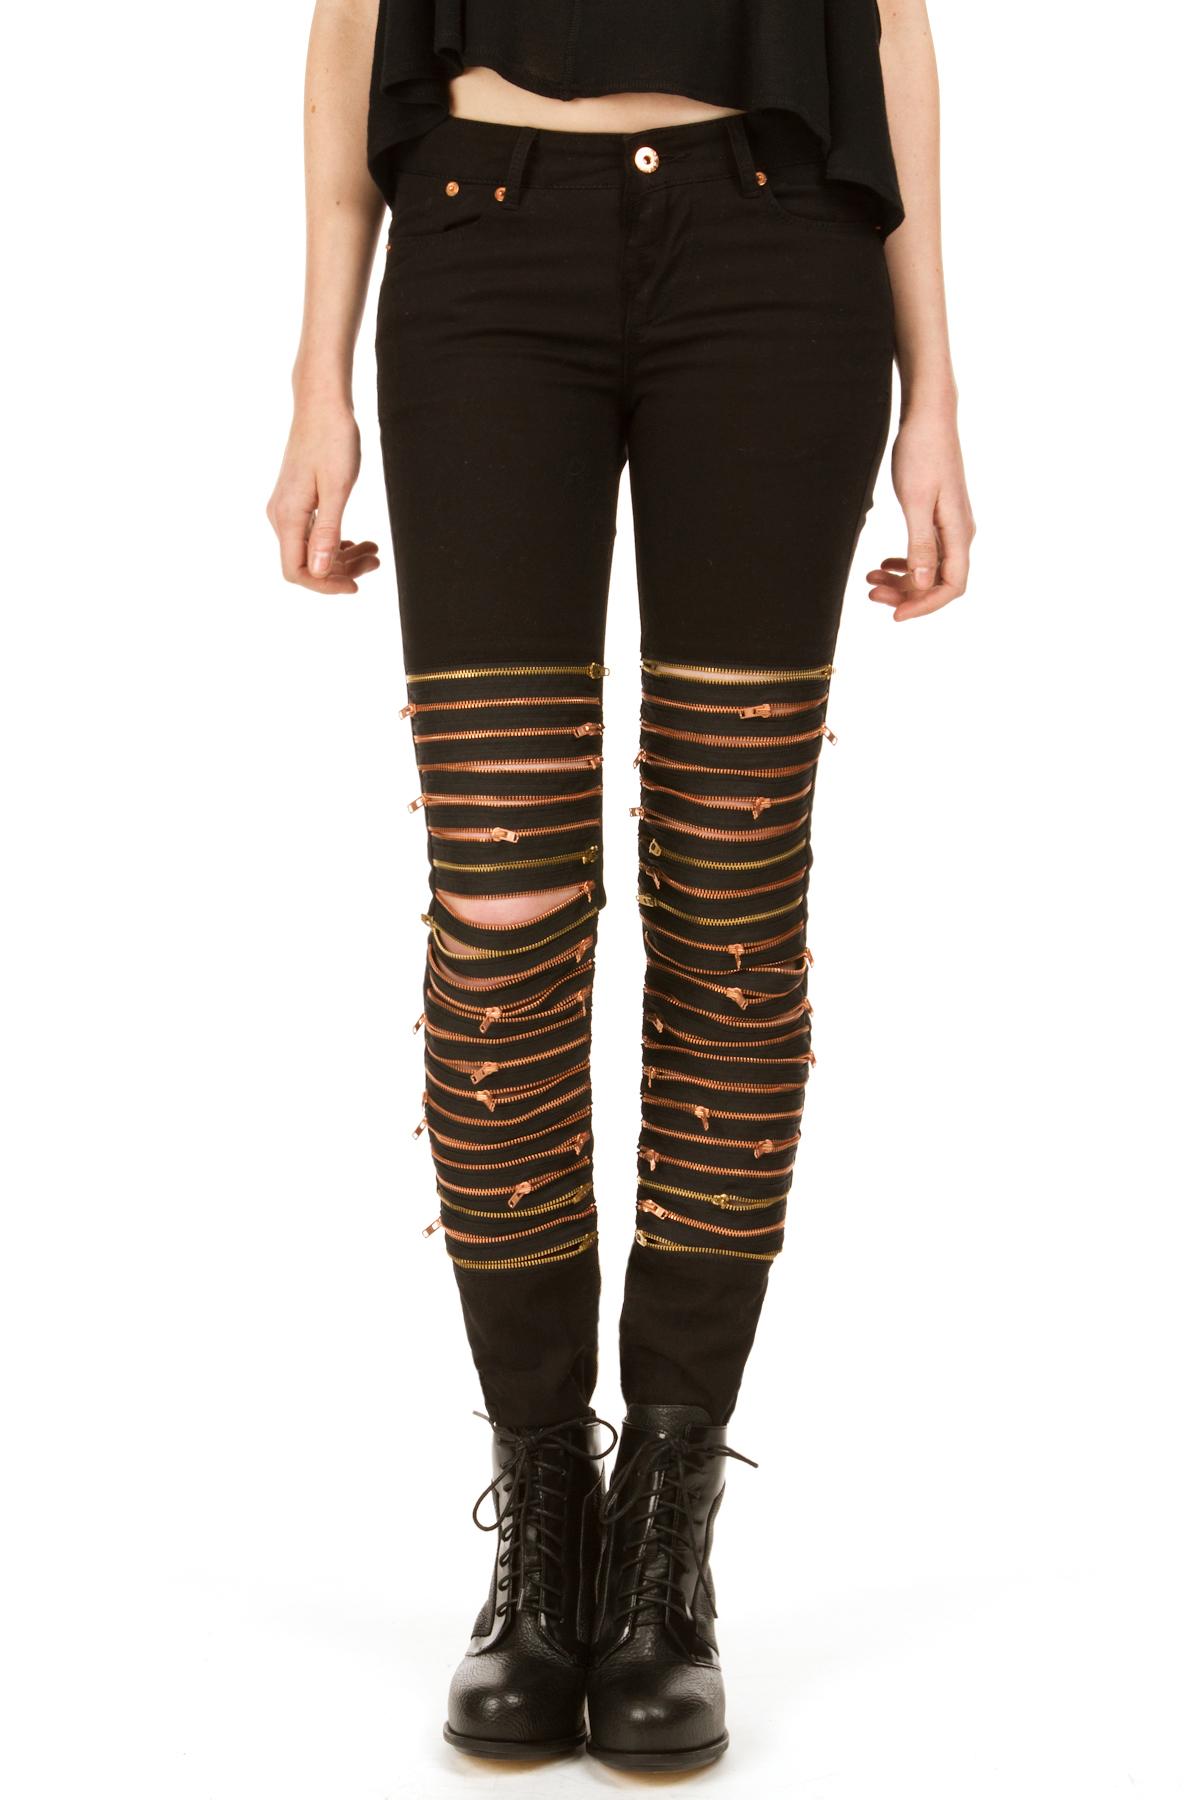 Avelon neon zip pants